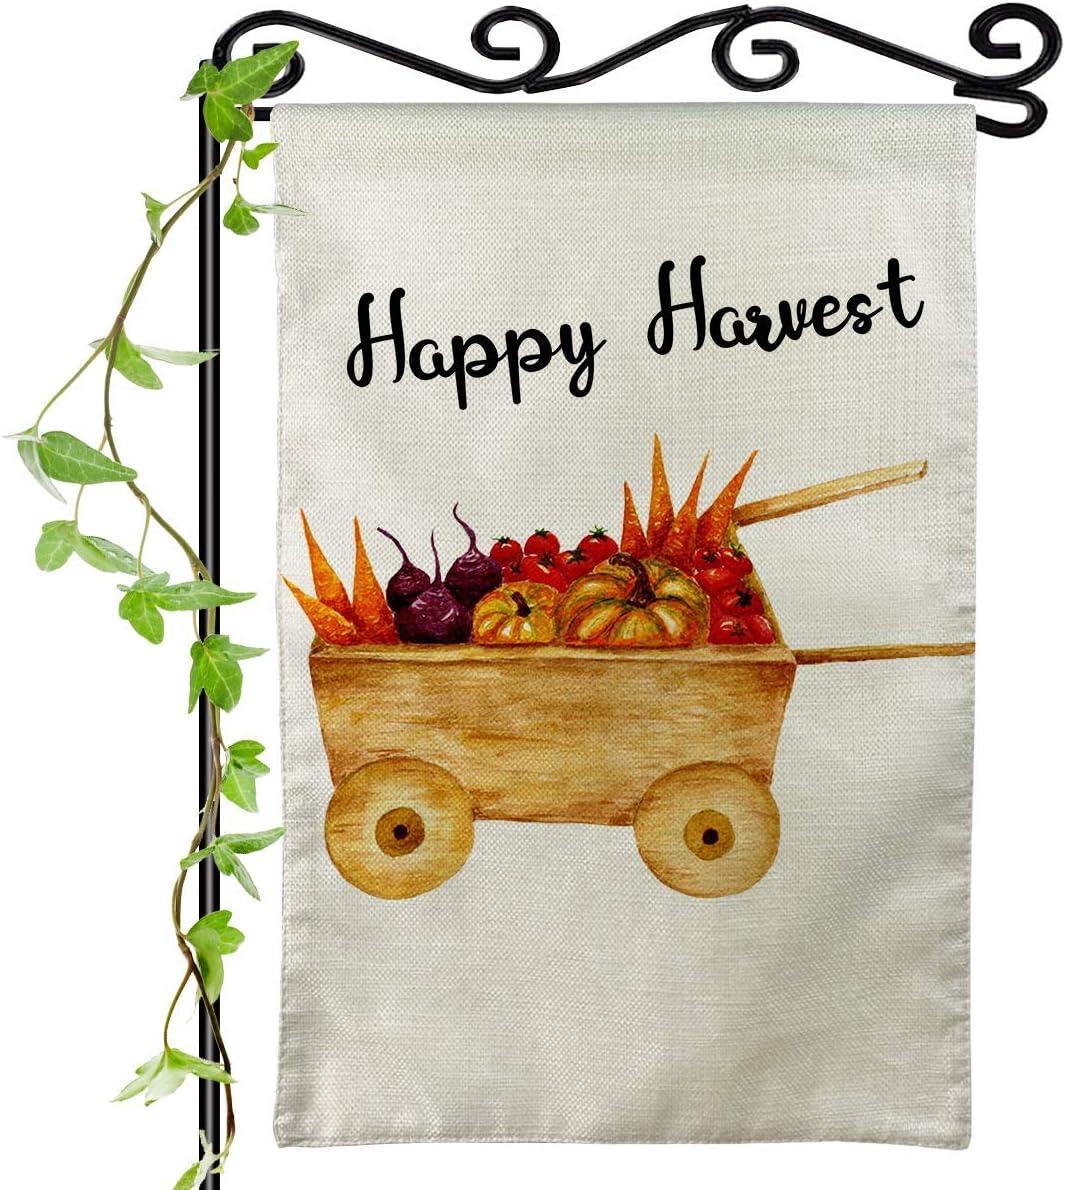 Happy Harvest Garden Flag Vertival Double Sided Autumn Cute Cart Tomato Crop Food Decorations Fall Rustic Farmhouse Burlap Outdoor Small Yard Flag 12x18